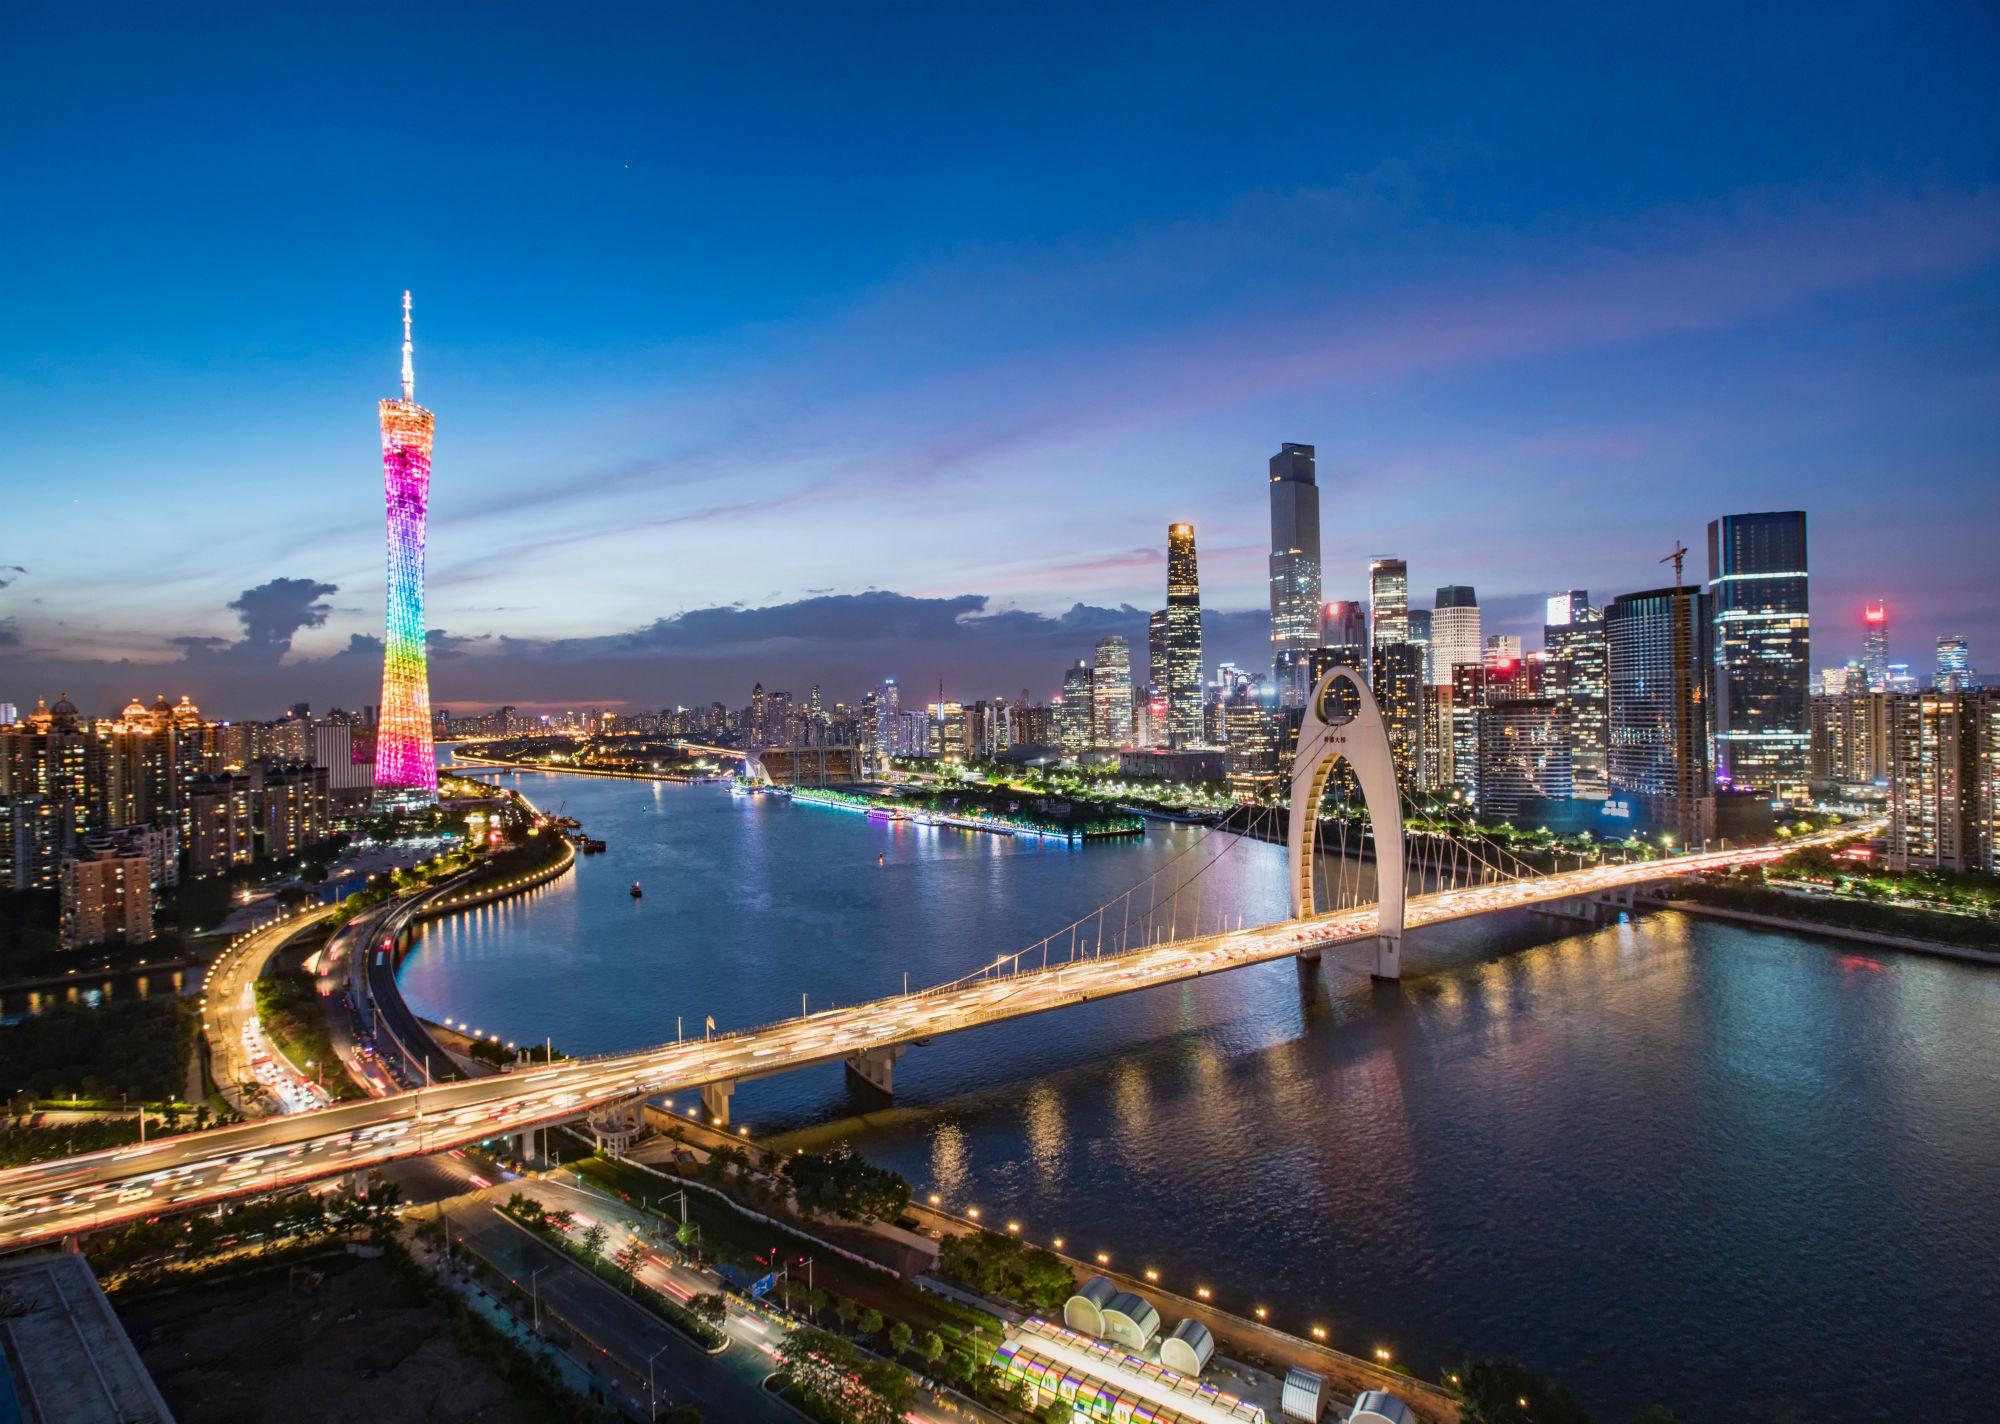 Dental South China 2019 – The 24th Dental South China International Expo